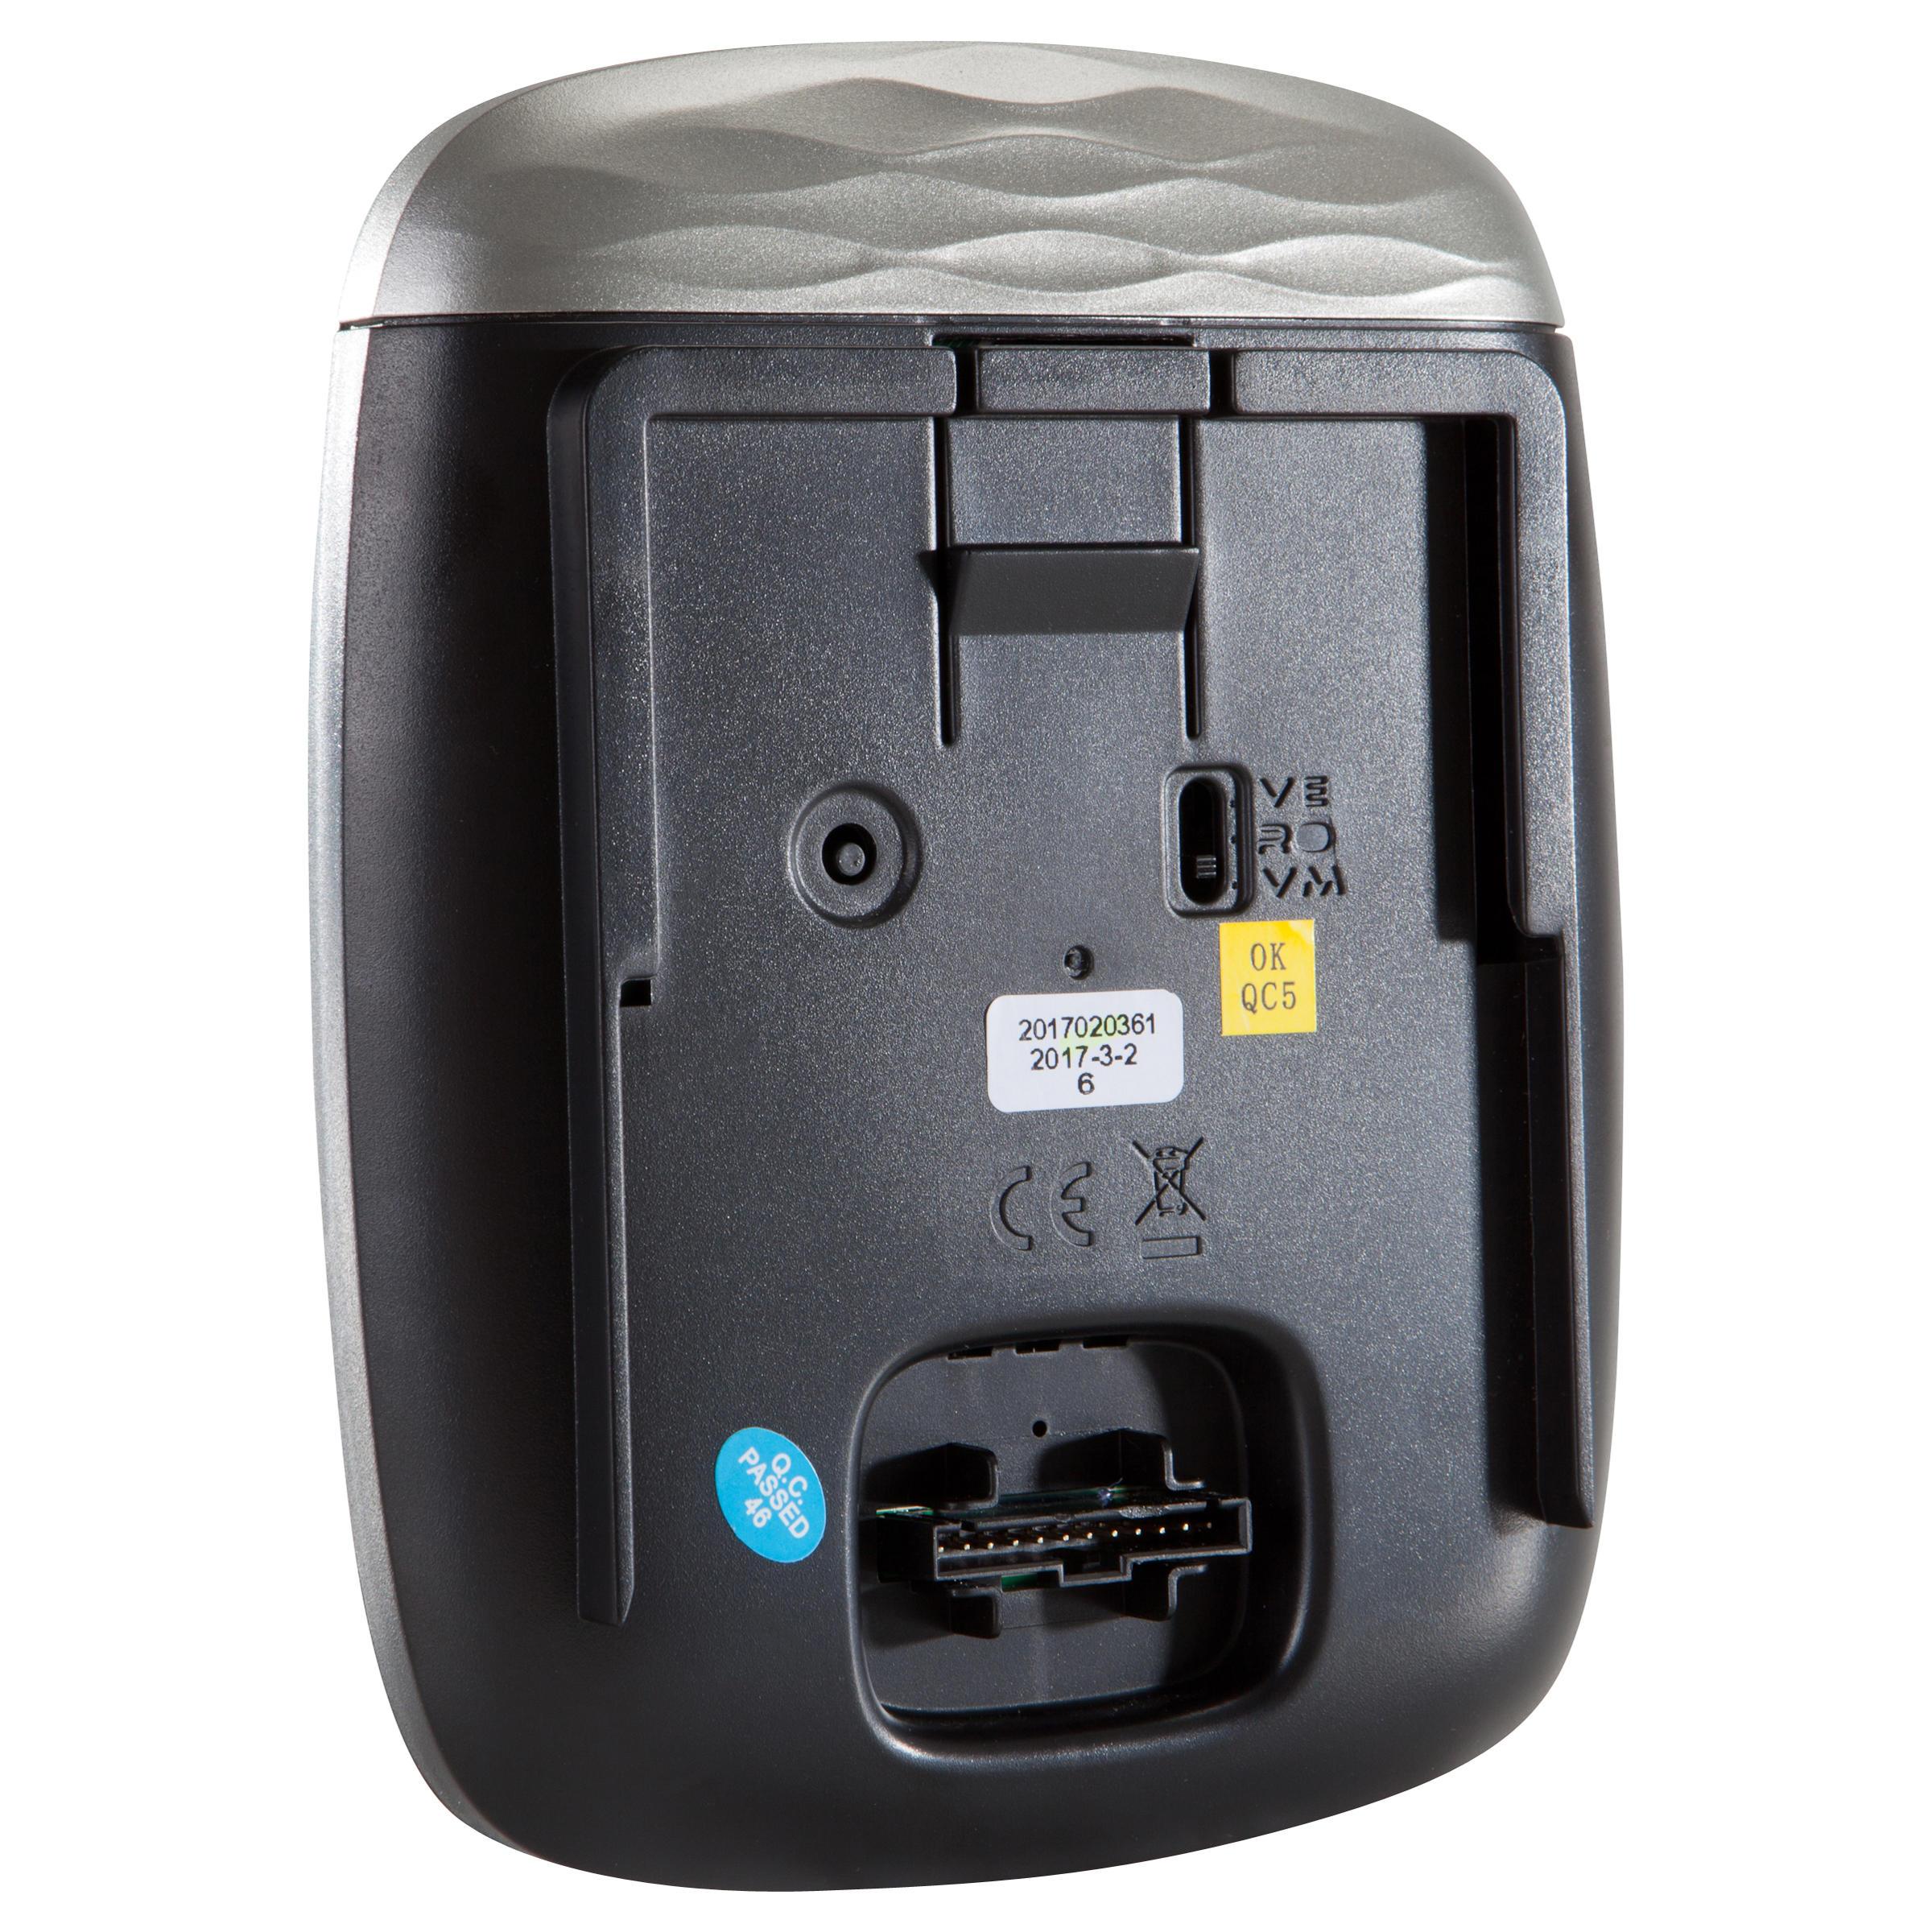 VM Comfort C2 Console